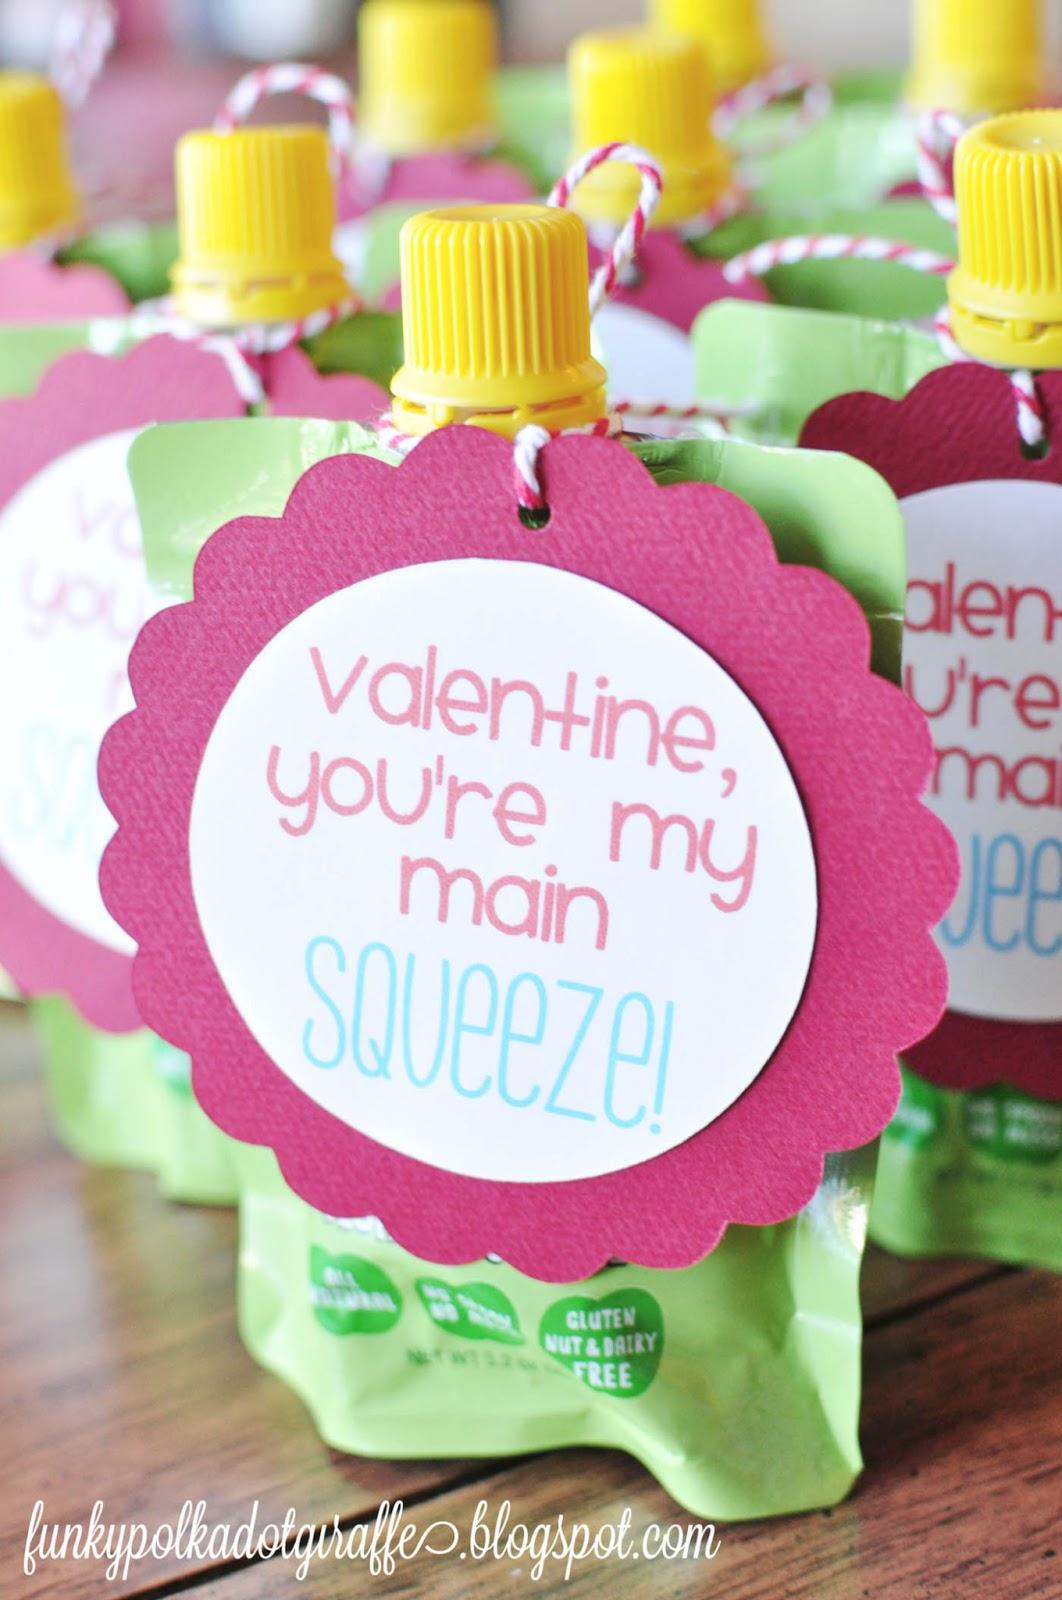 Preschool Classroom Valentine Ideas ~ Funky polkadot giraffe preschool valentines you re my